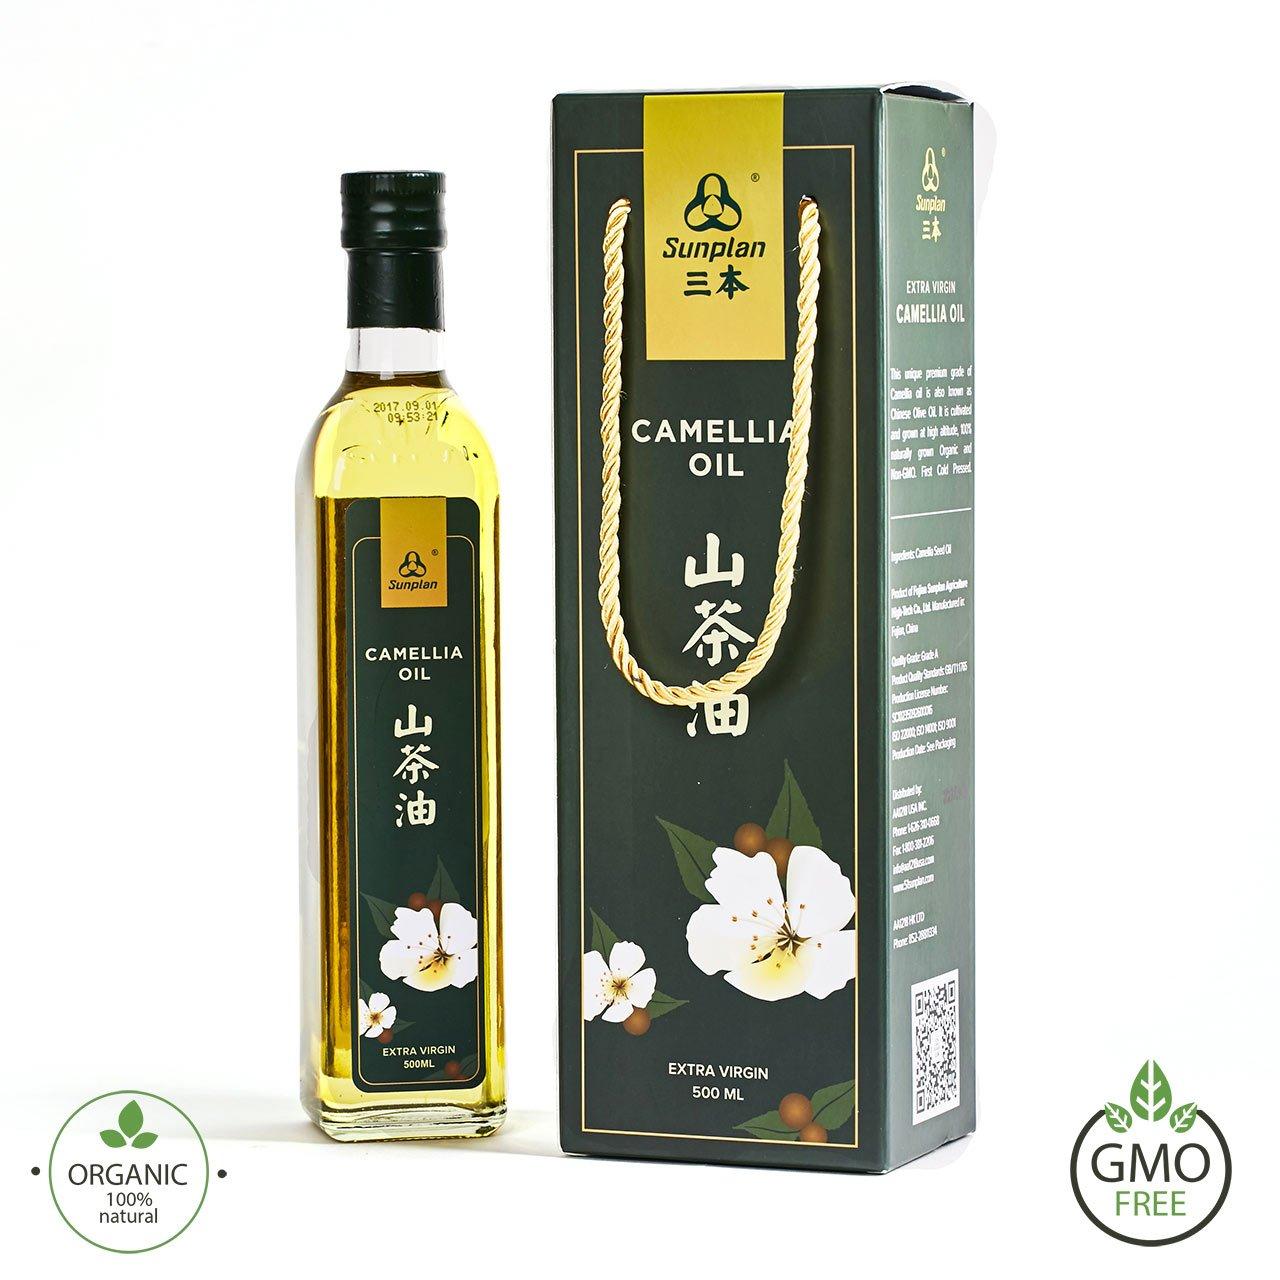 Sunplan Camellia Tea Seed Oil Organic Extra Virgin Cooking Oil (500ml with Gift Box)